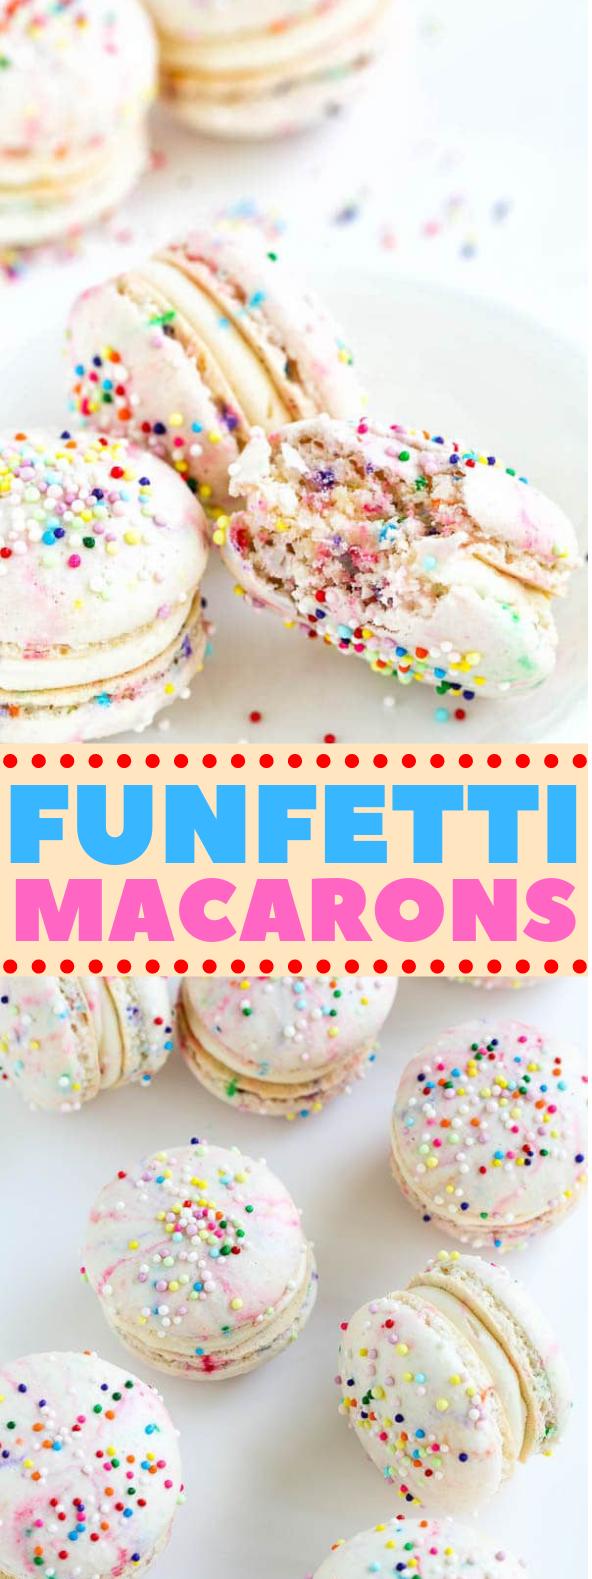 Funfetti Macarons #dessert #cookies